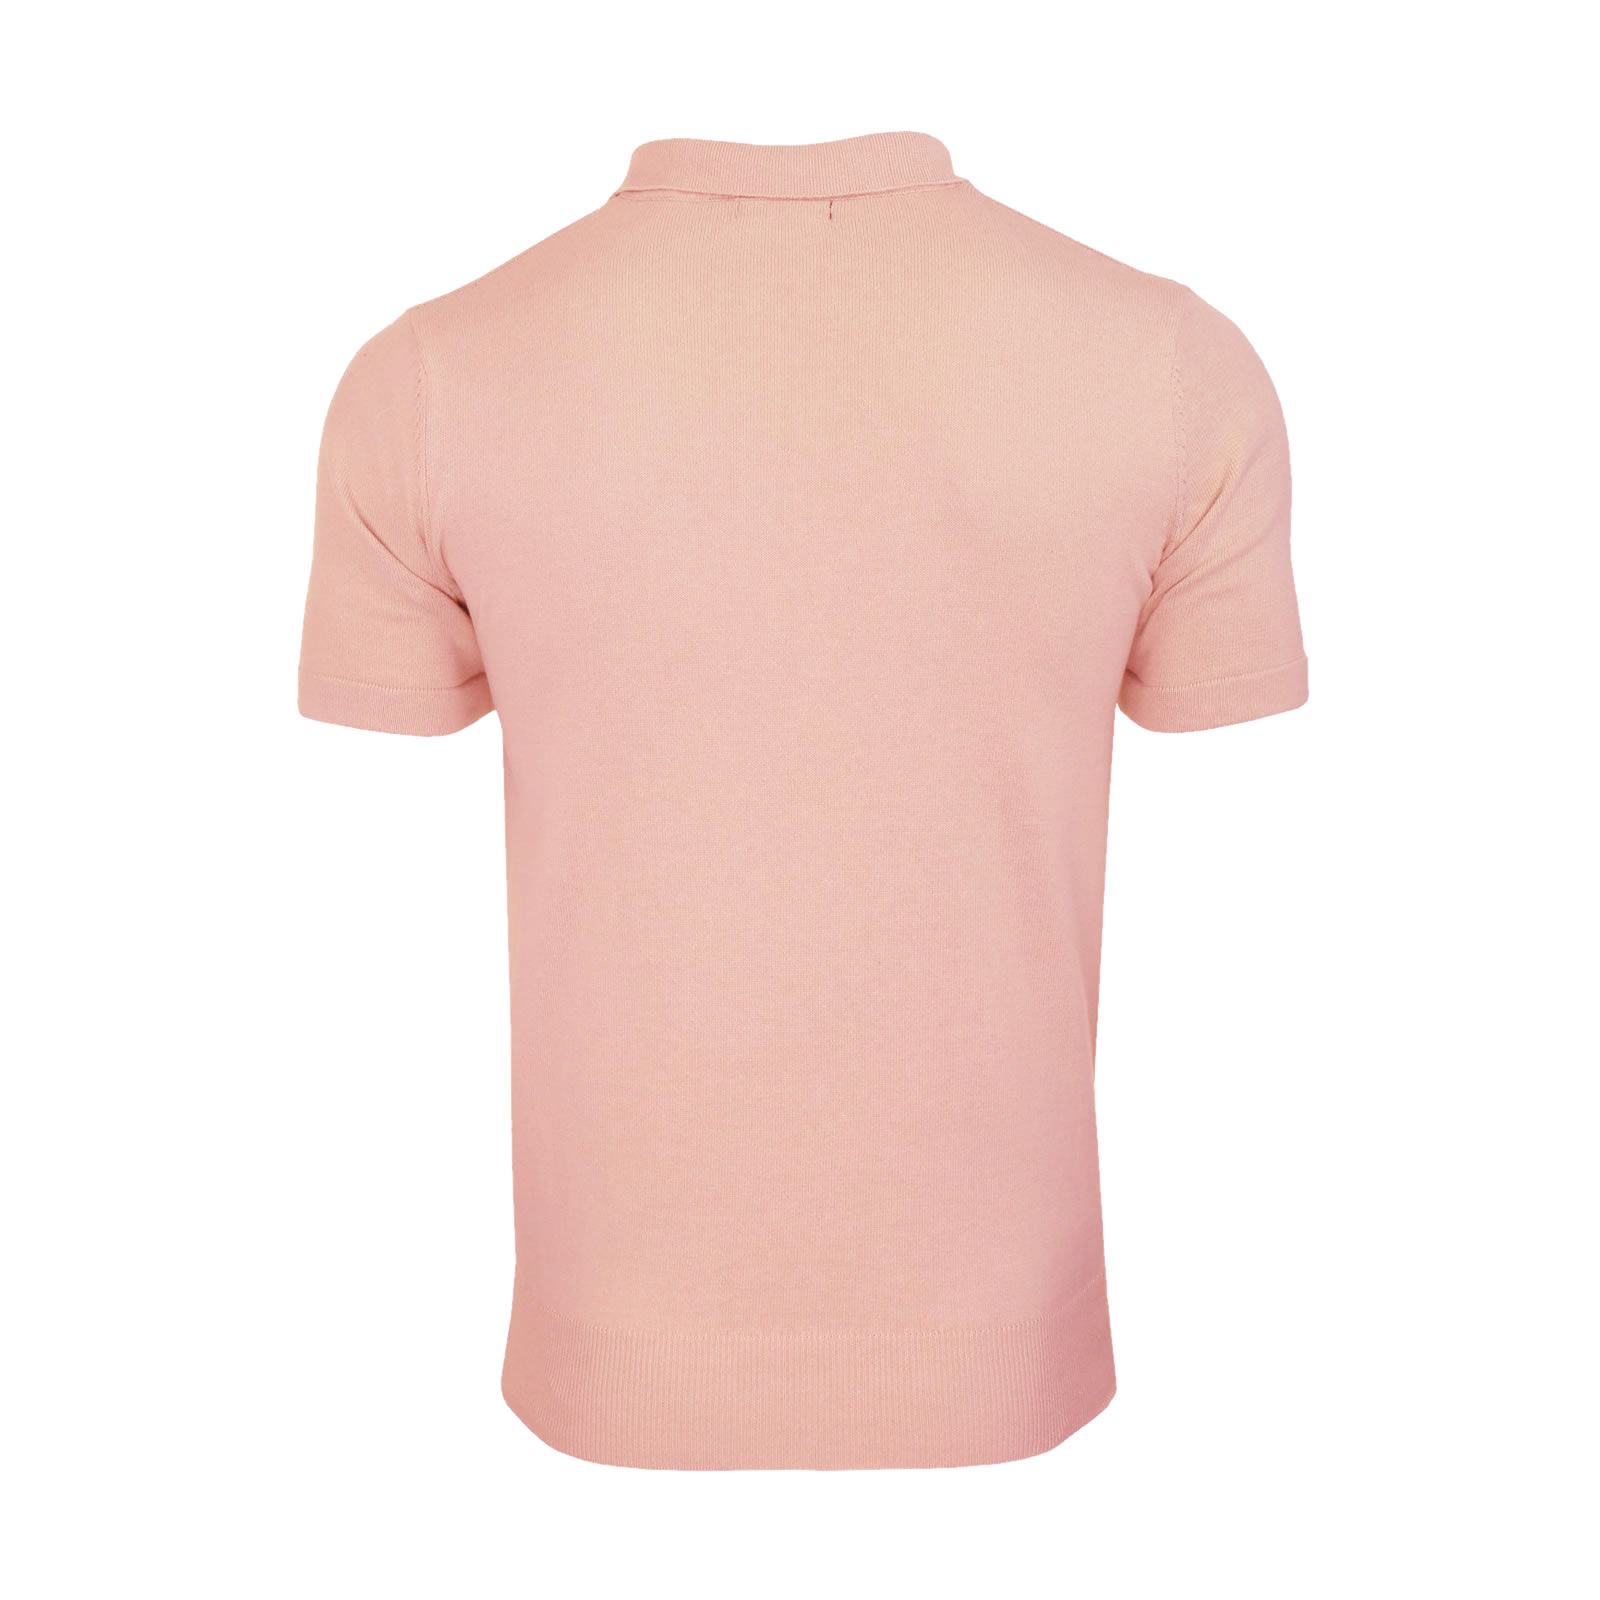 Mens-Knitted-Polo-Brave-Soul-Columbus-Collared-Short-Sleeve-Jumper-T-Shirt thumbnail 3